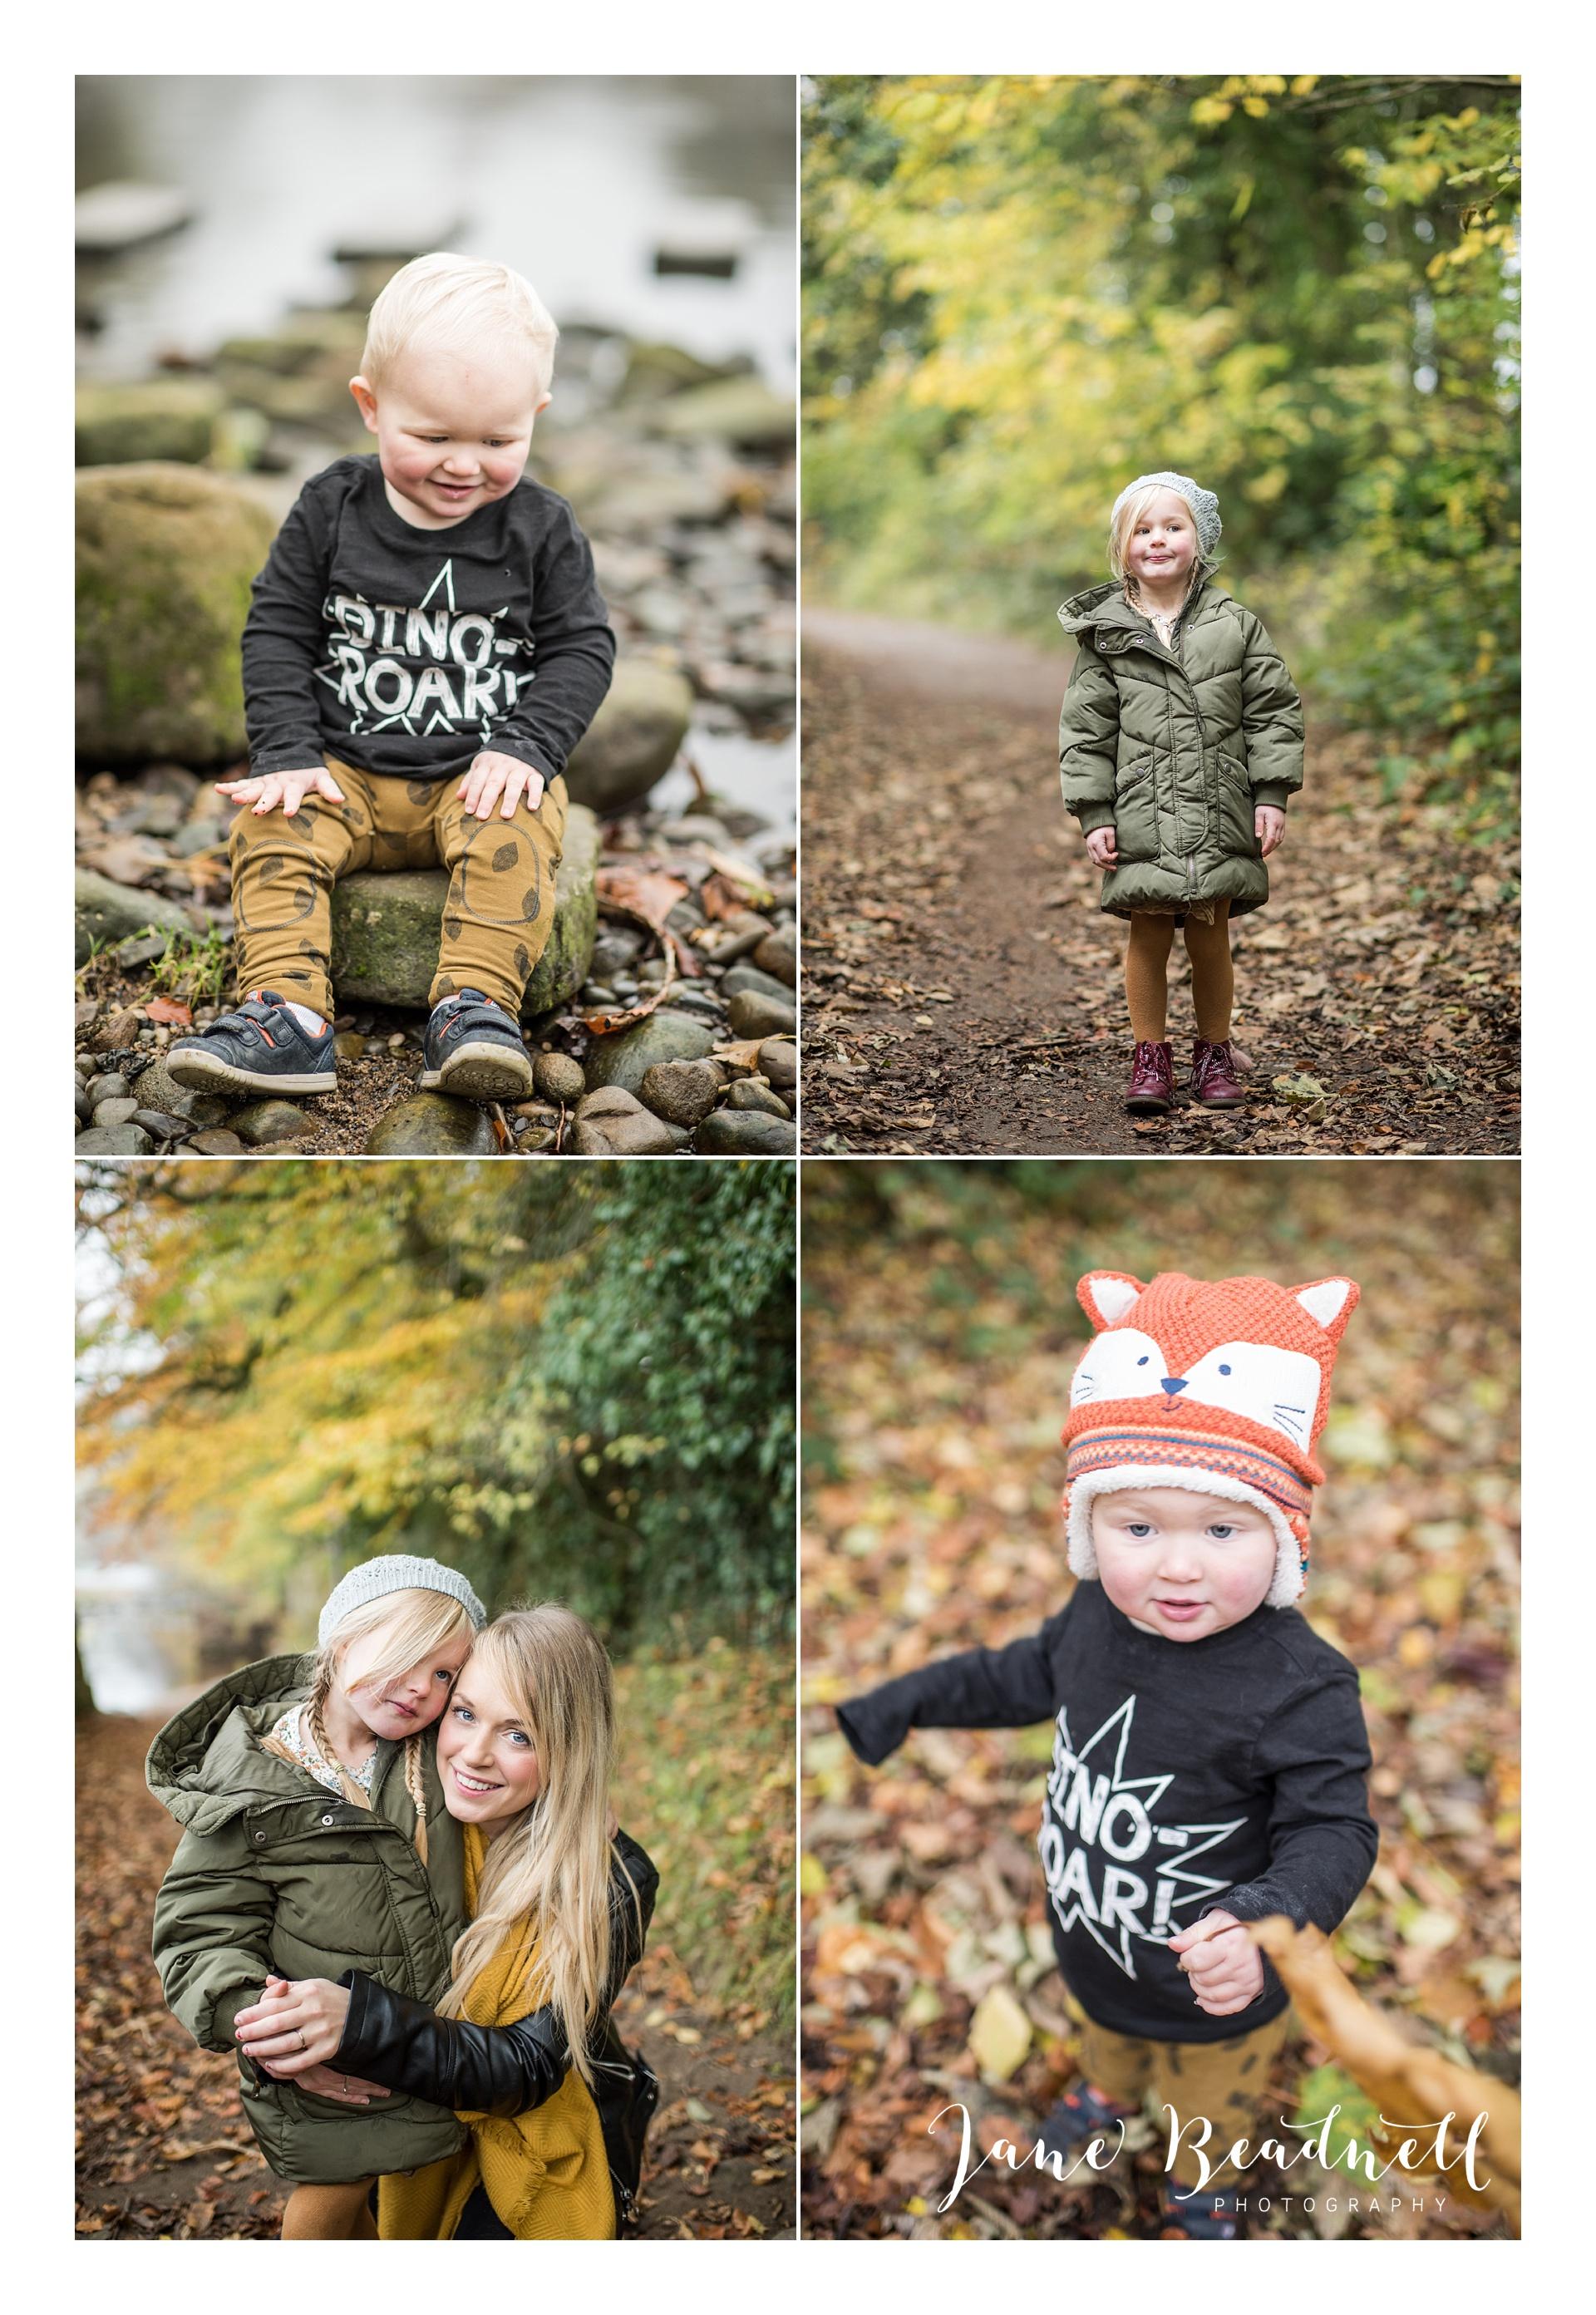 Yorkshire family photographer, Yorkshire portrait photography, Otley family photographer, Ilkley family photographer, Harrogate family photographer.